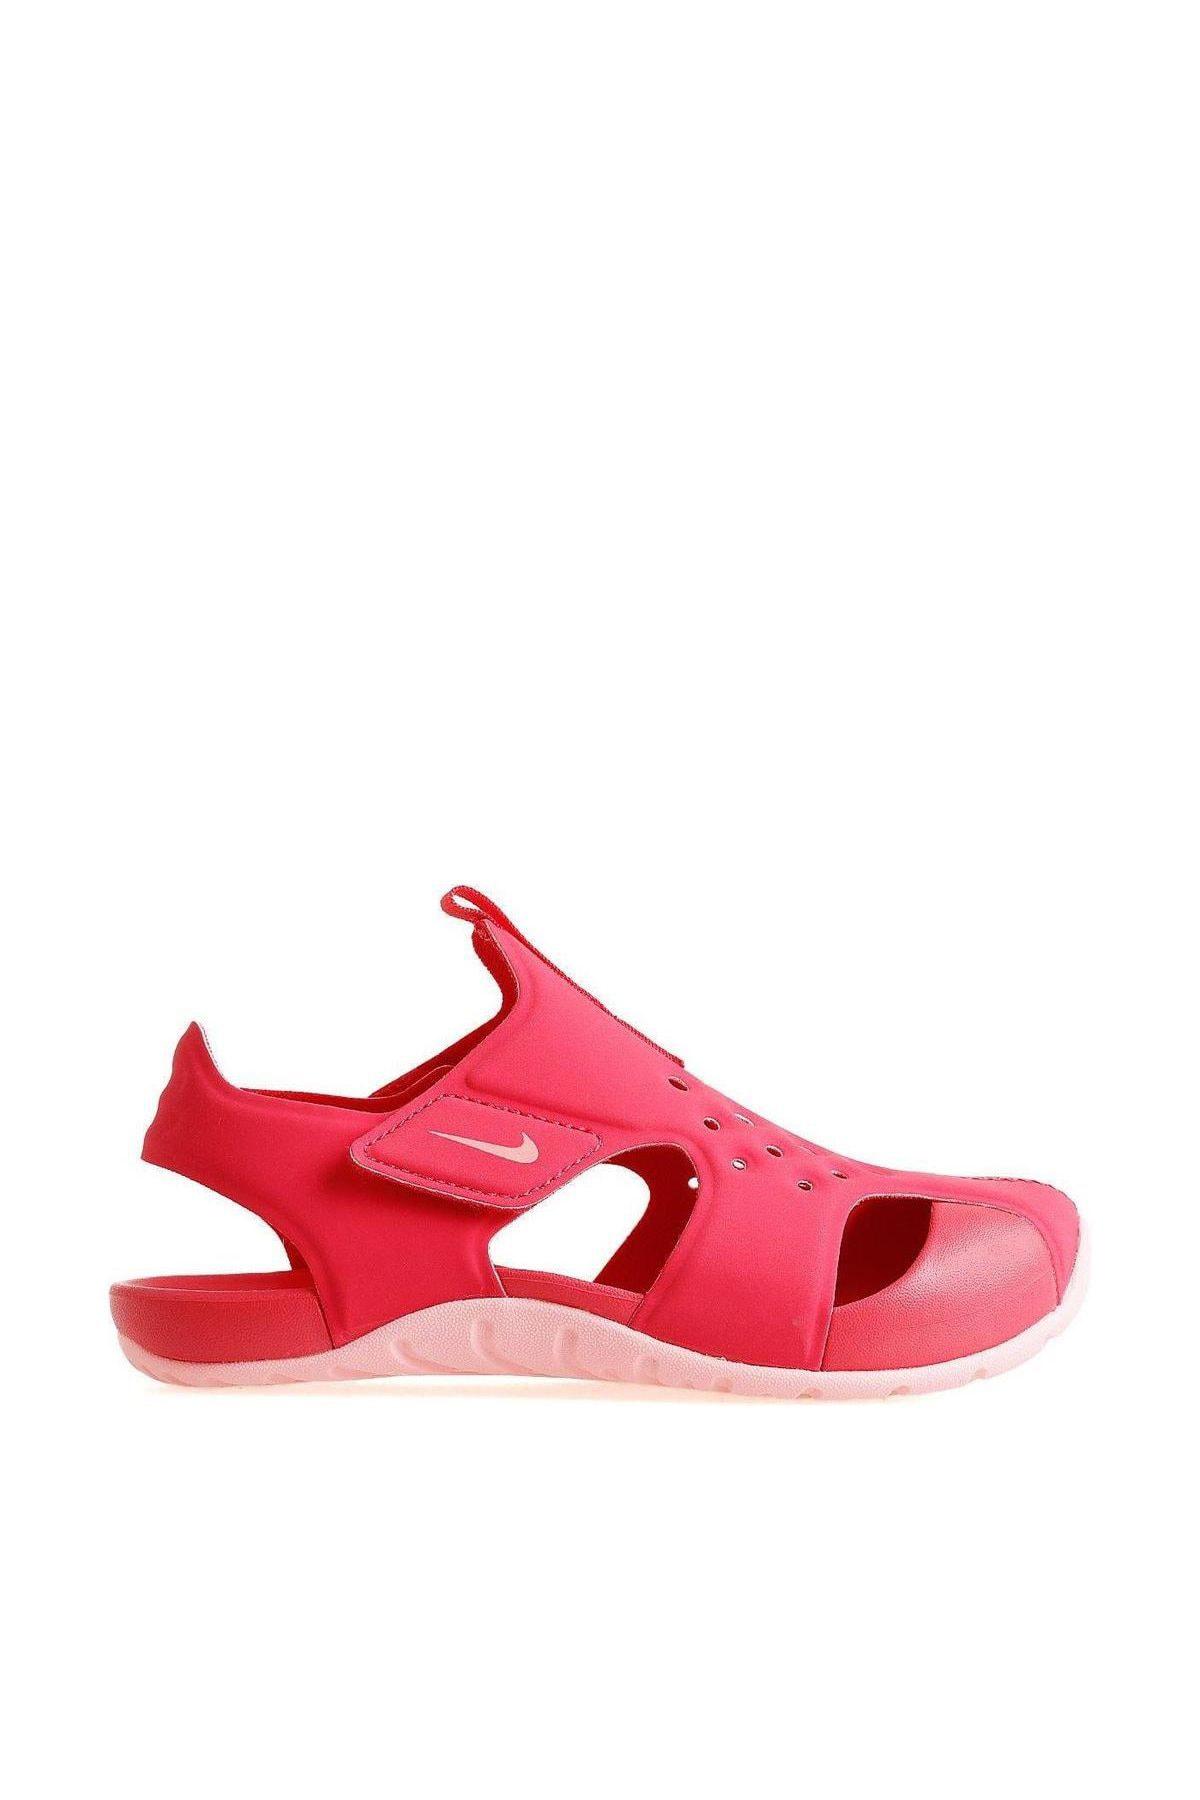 Nike Kids Çocuk Pembe Sandalet 1